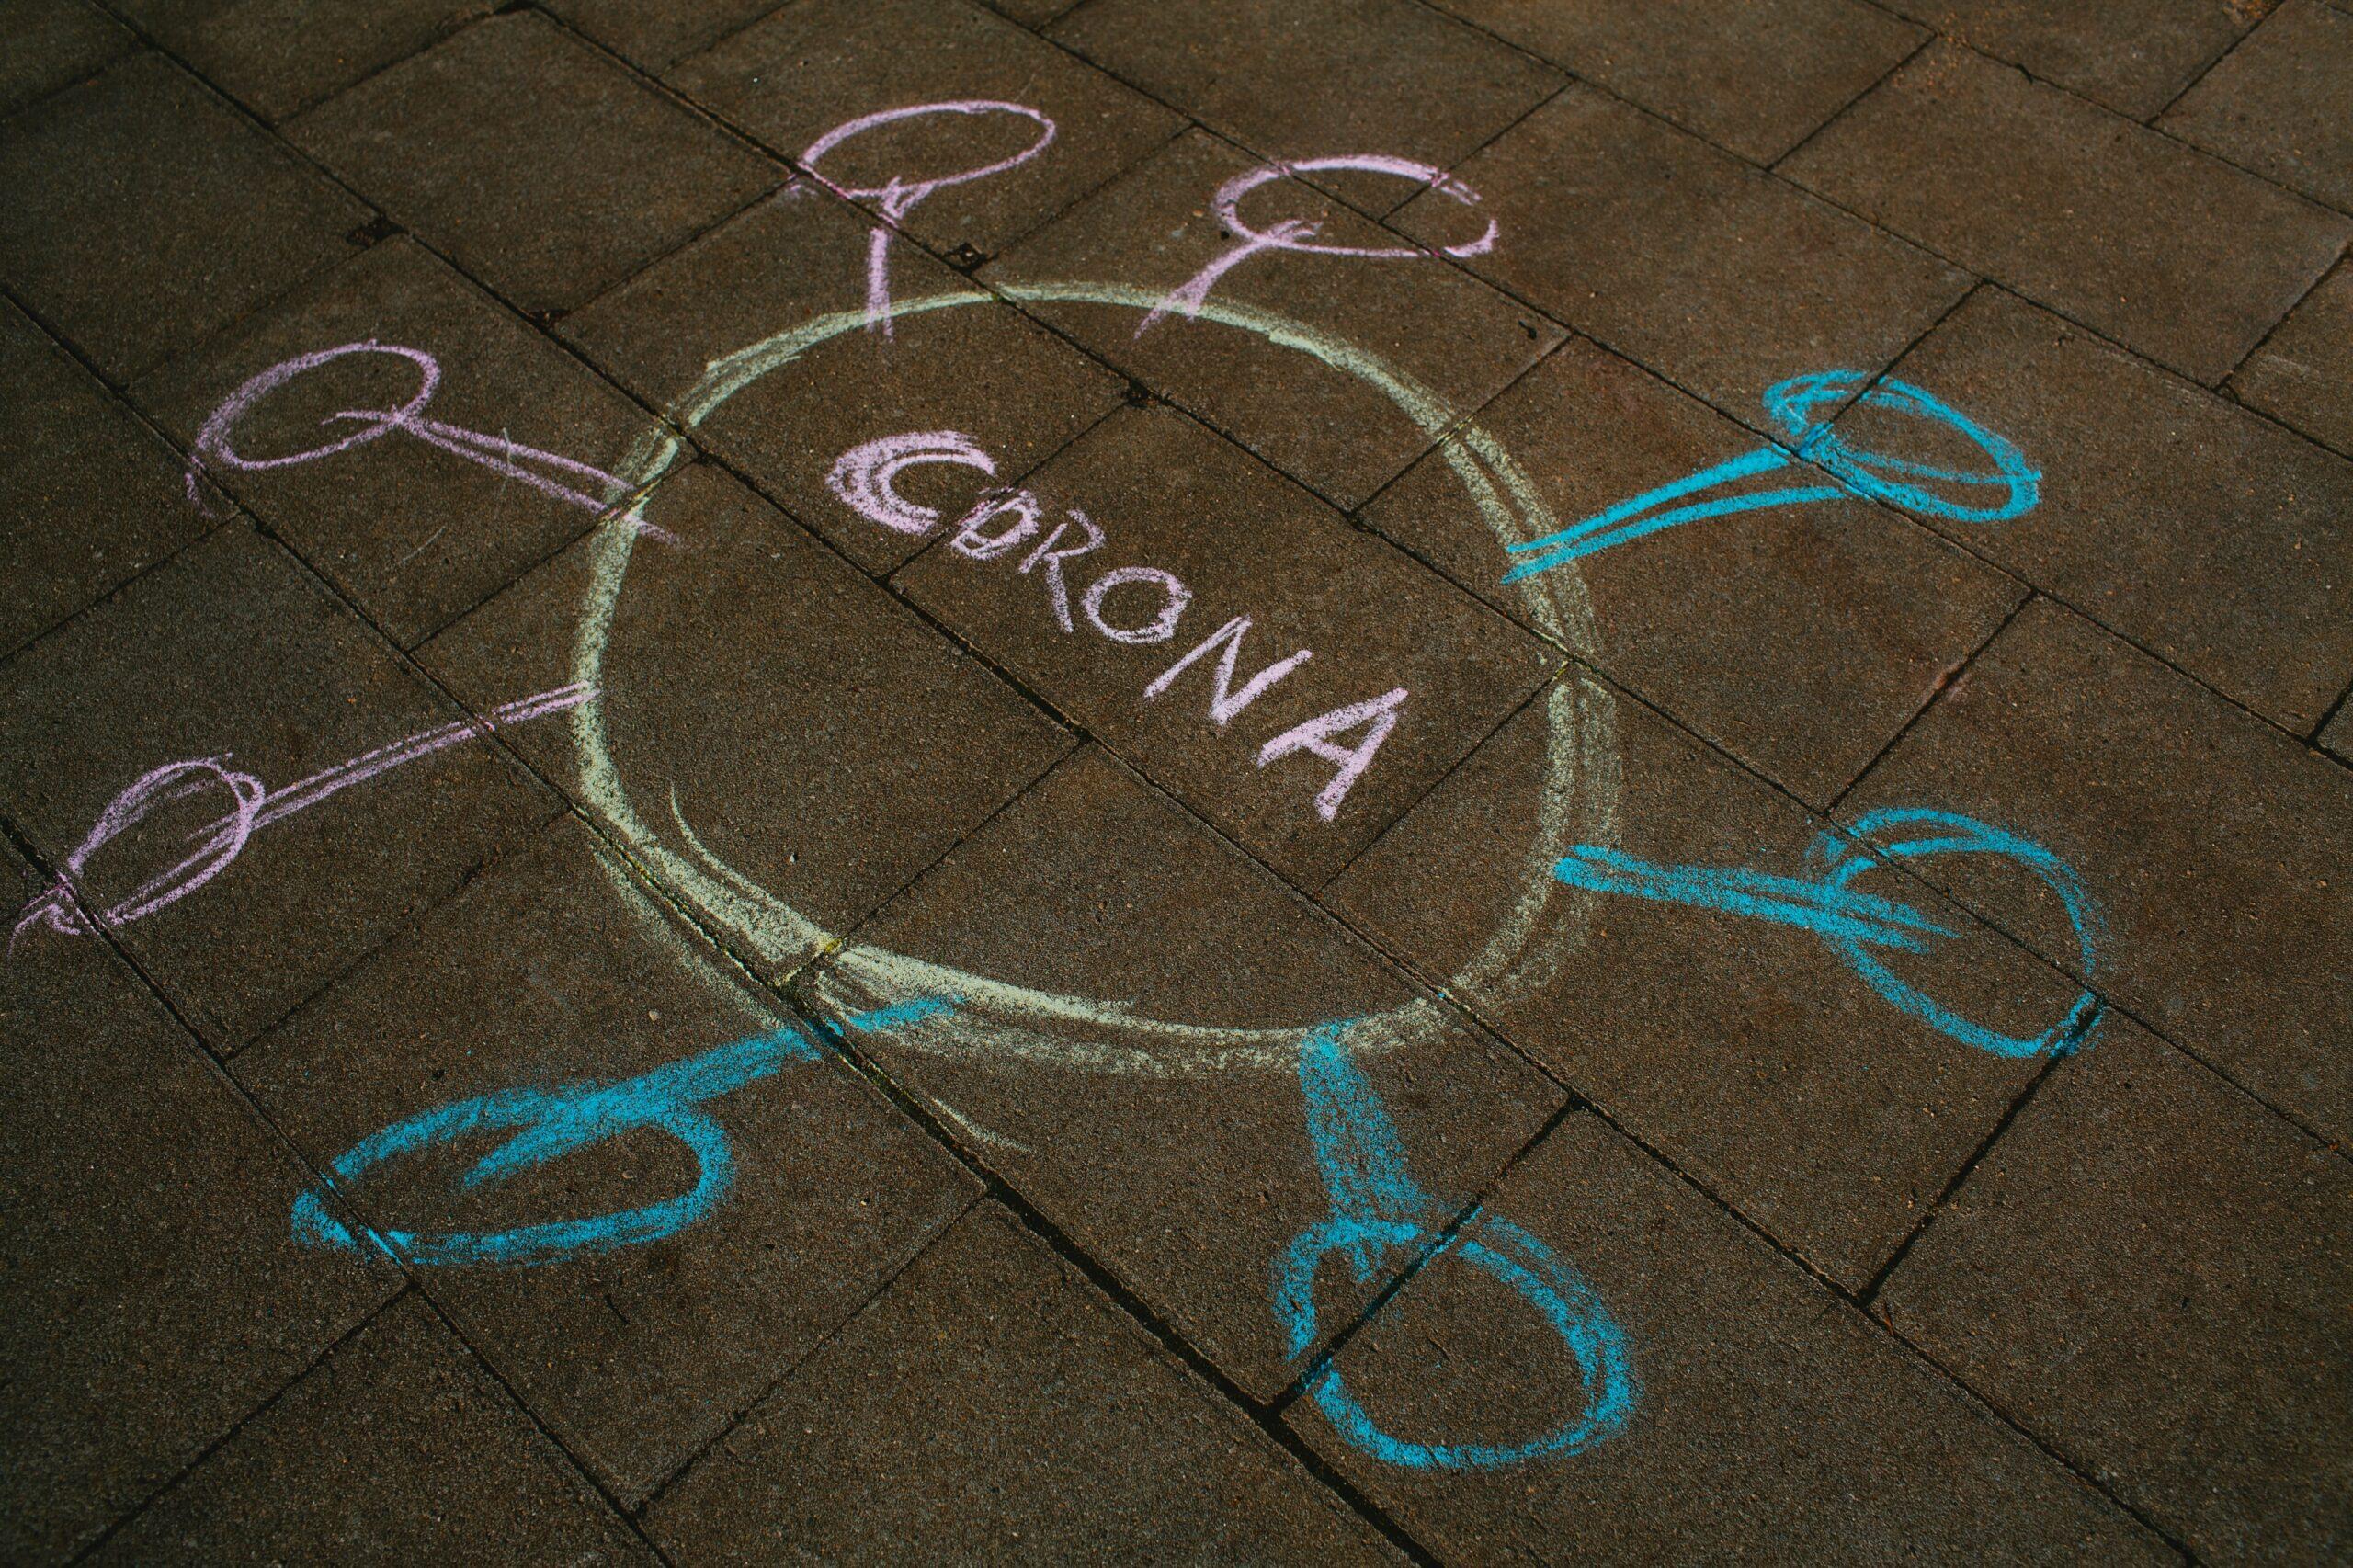 A photo of a chald cartoon of a coronavirus drawn on a concrete block sidewalk.